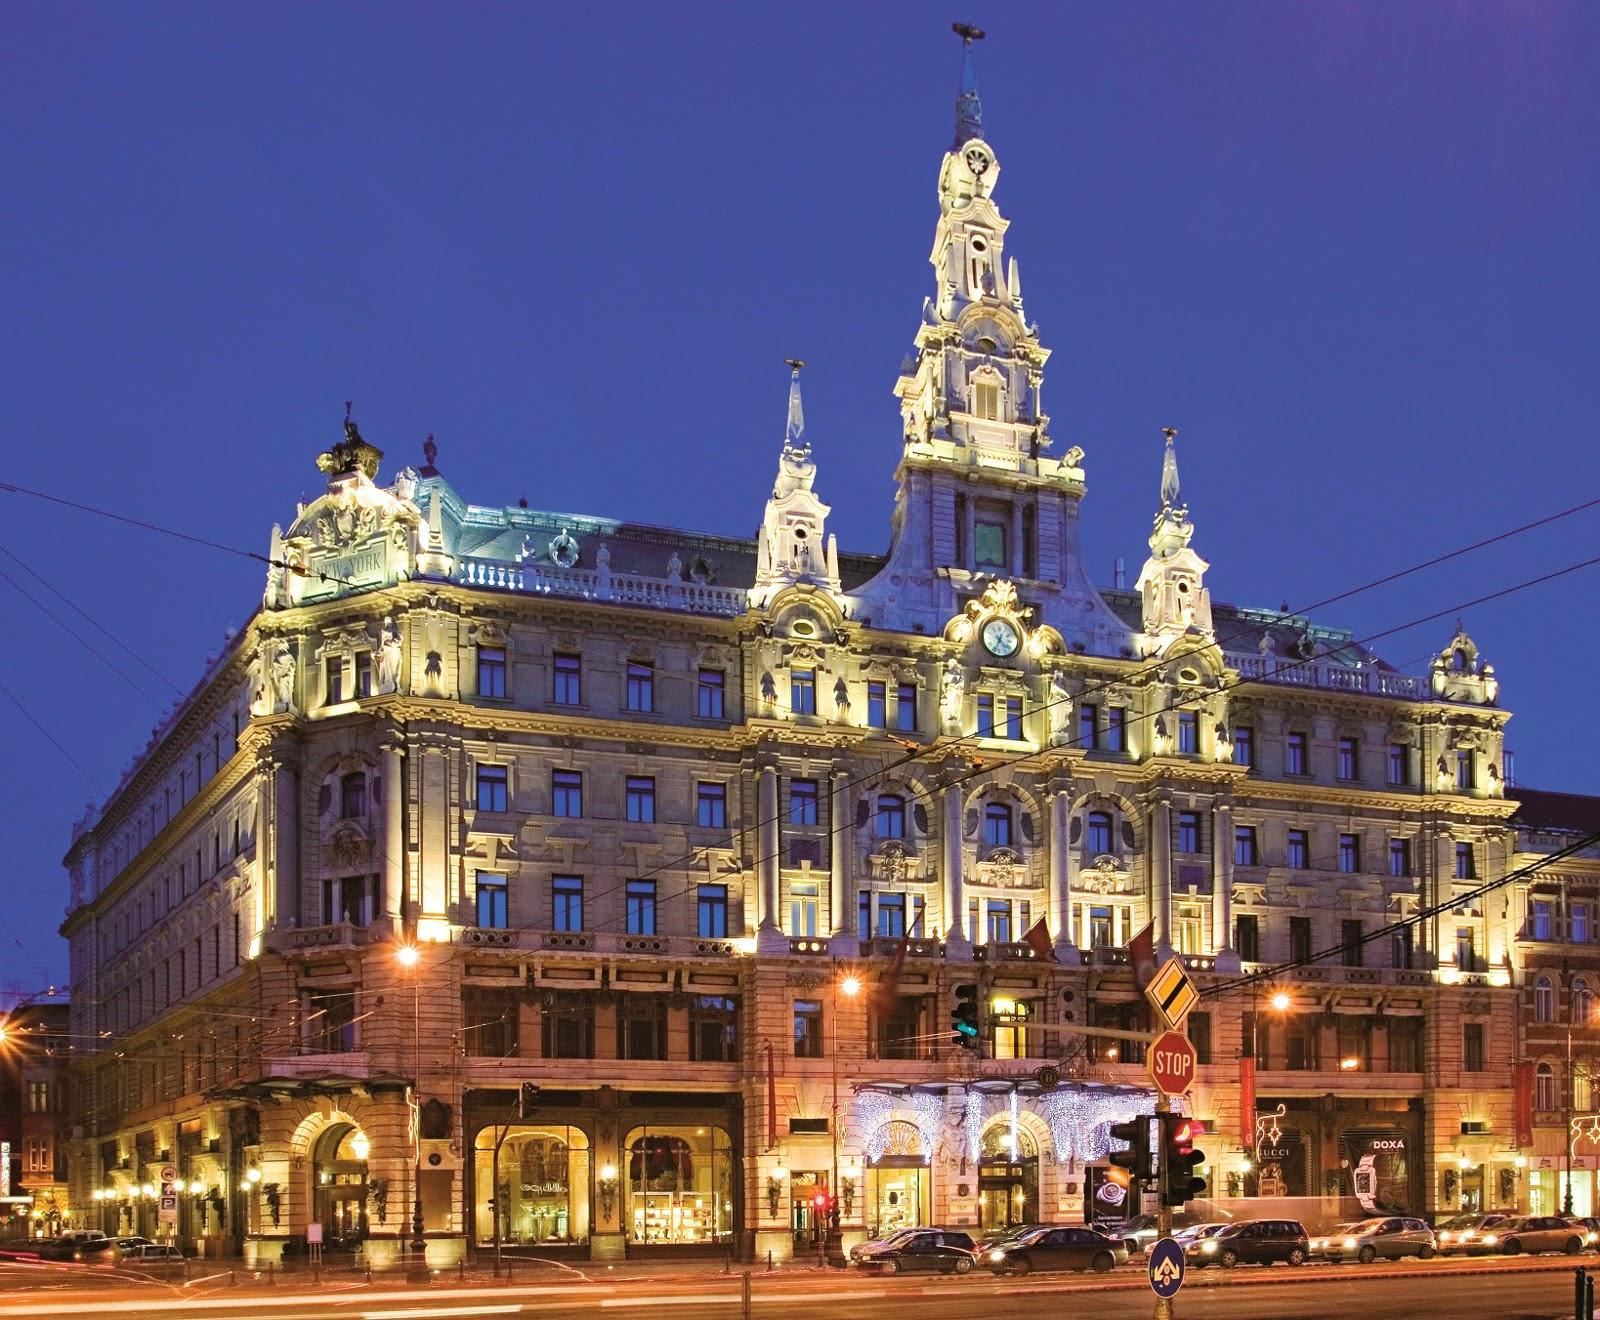 Luxury Hotels  The New York Palace Hotel